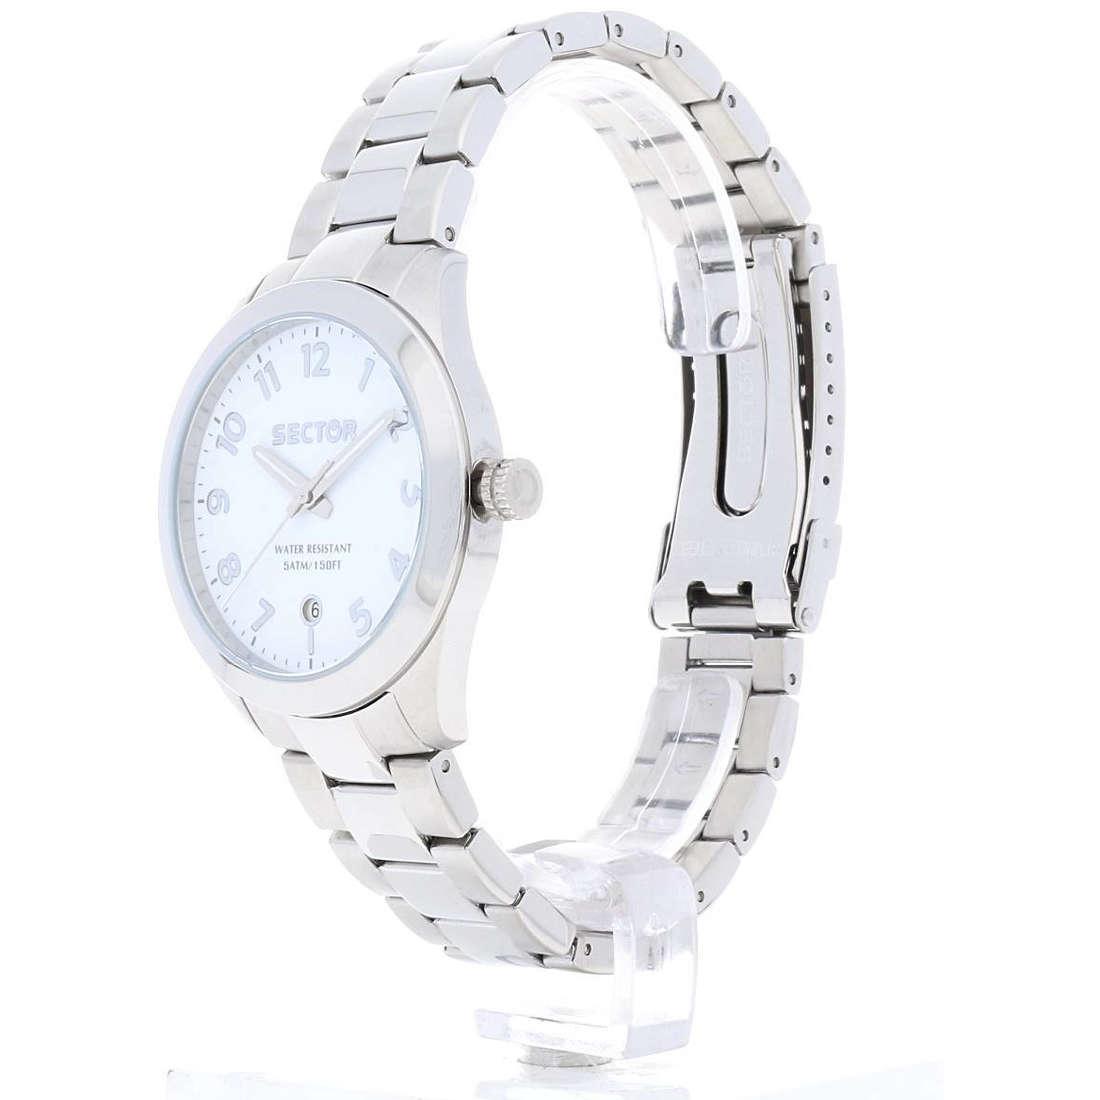 vendita orologi donna Sector R3253588509